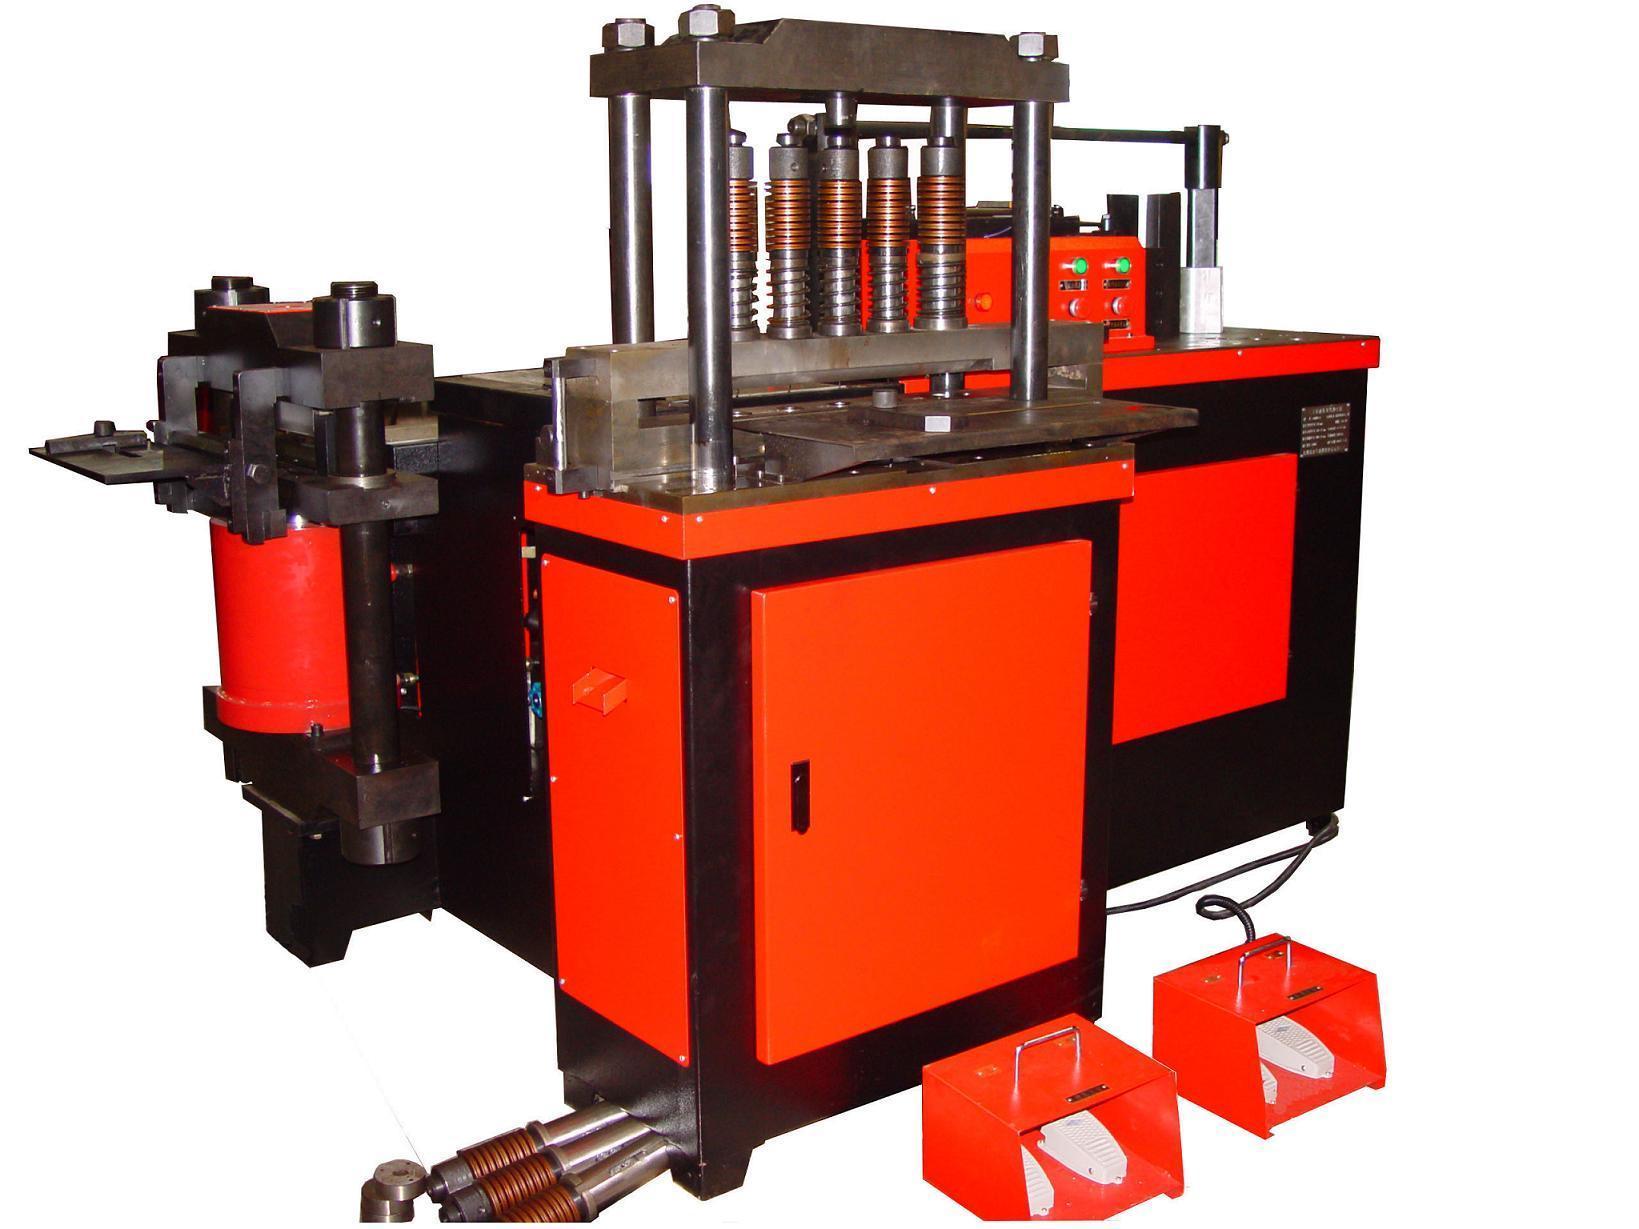 kjw303-t三工位液压母线加工机图片